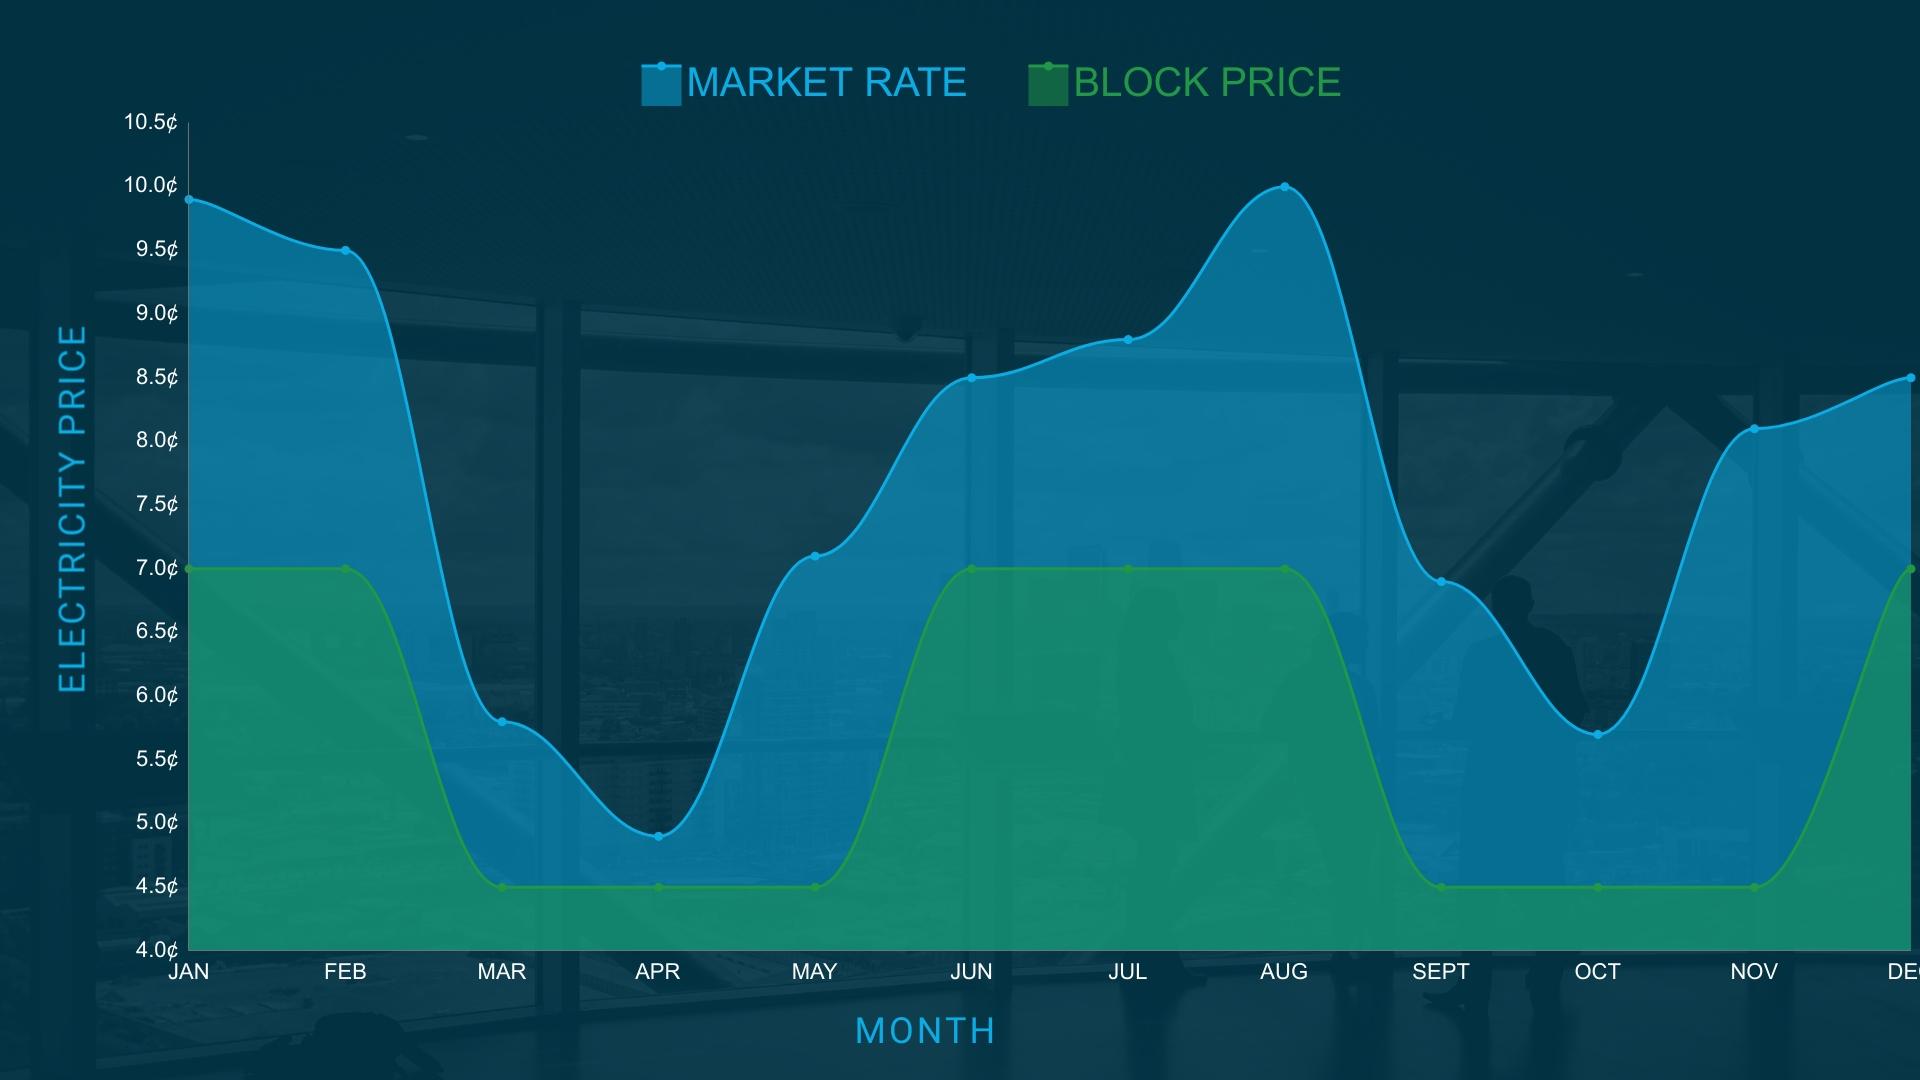 block-index-electricity-rates